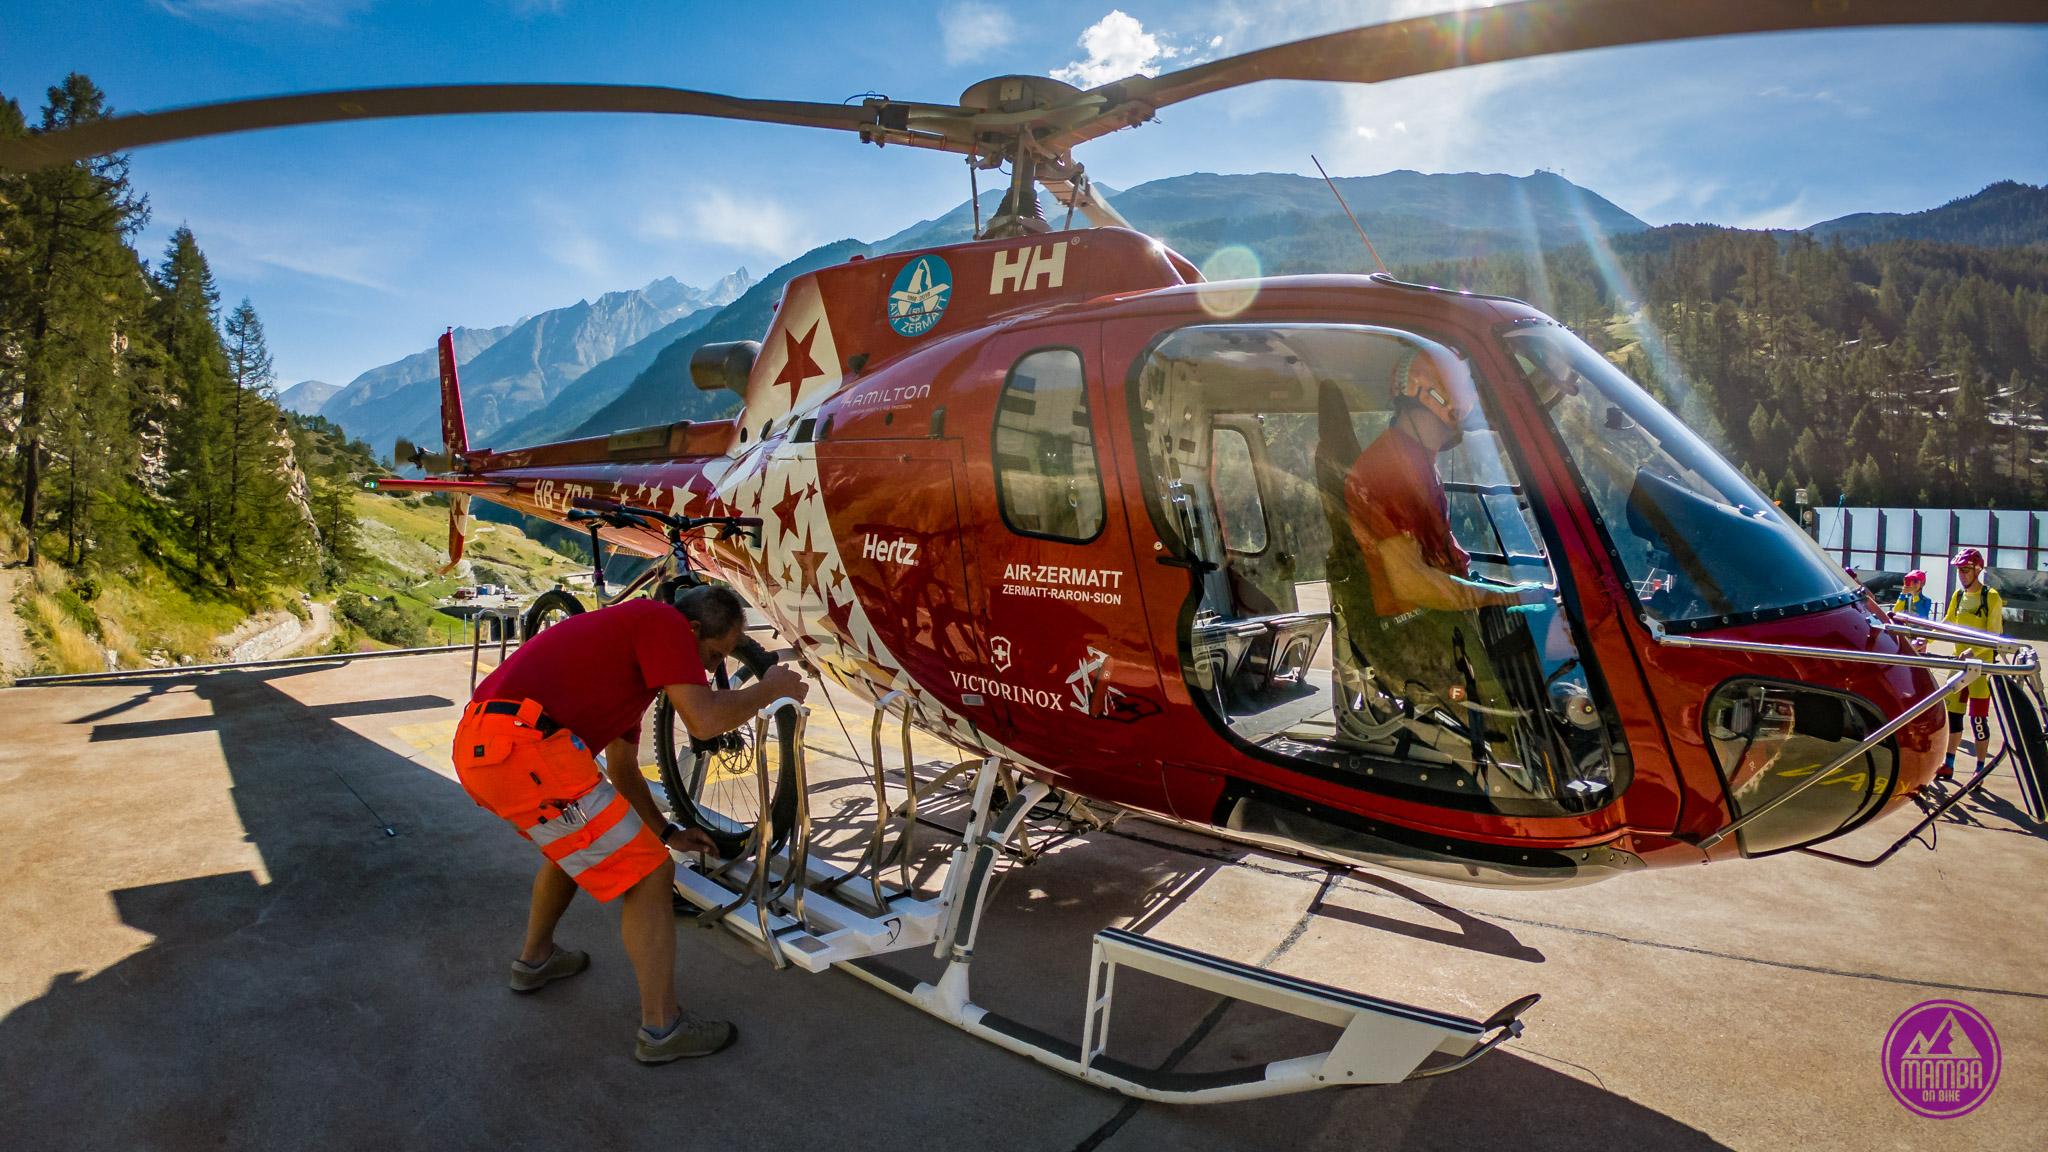 Heli biking - montowanie roweru na helikopter